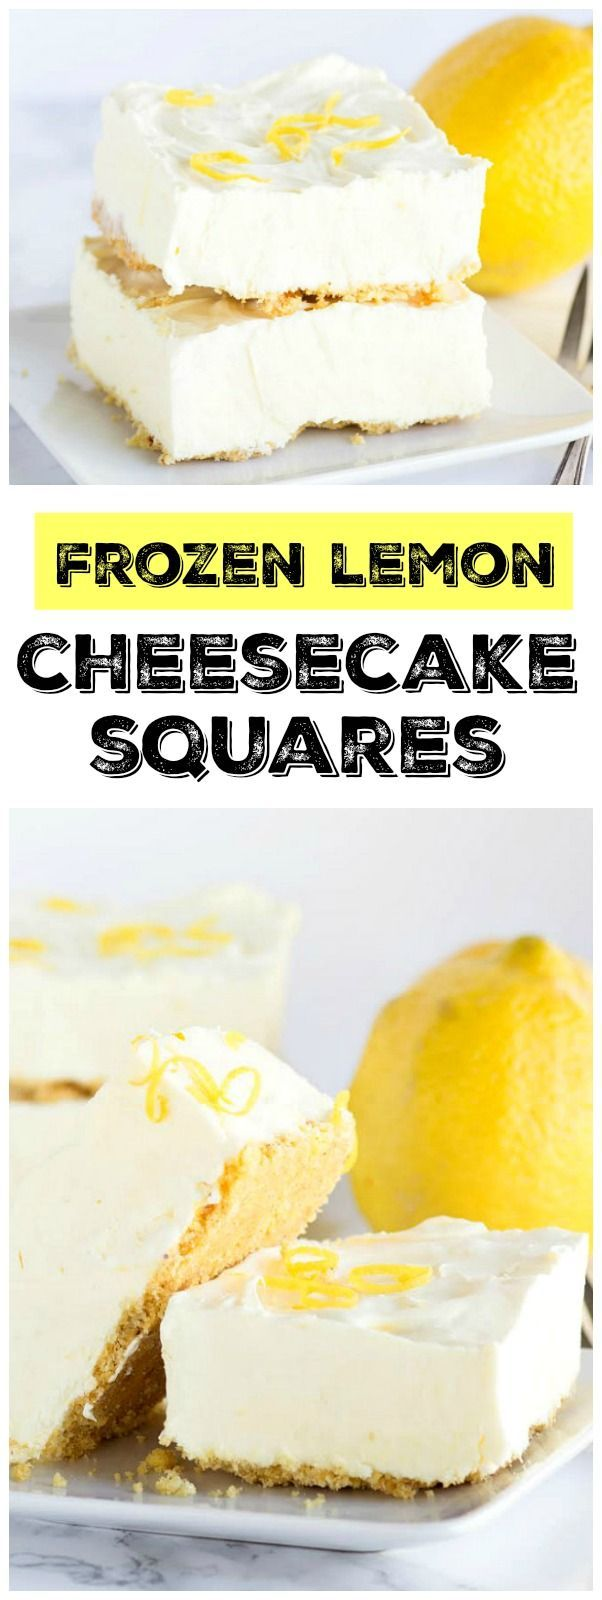 Easy Frozen Lemon Cheesecake Squares : the perfect summer dessert recipe!  : from http://RecipeGirl.com